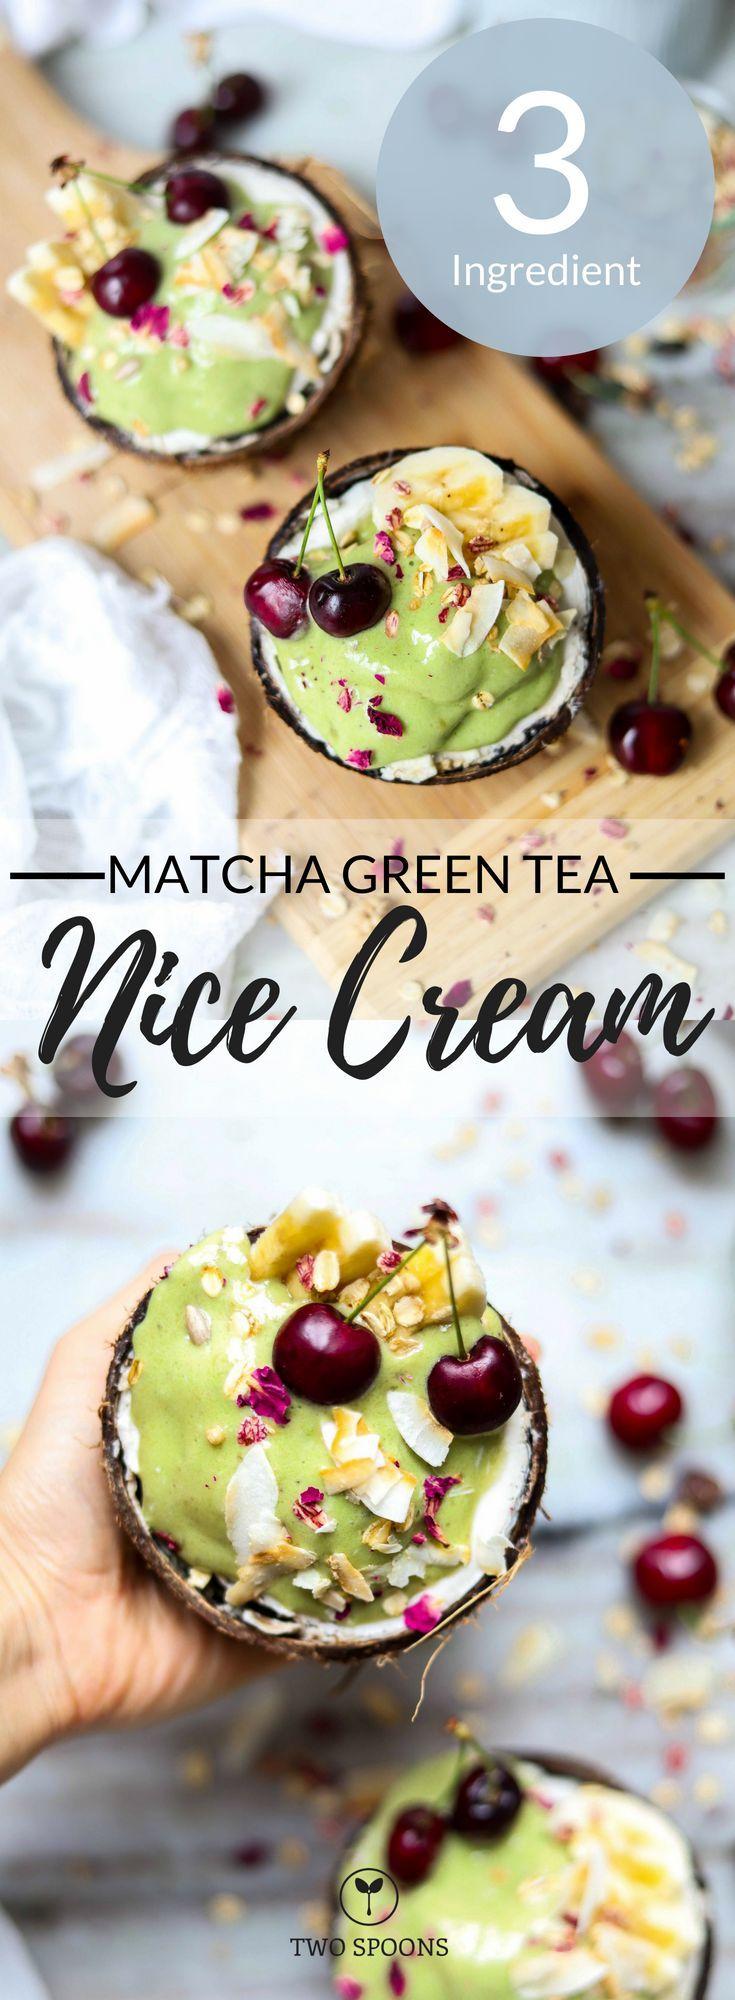 Photo of Matcha Green Tea Nice Cream   Frozen Treat   Two Spoons